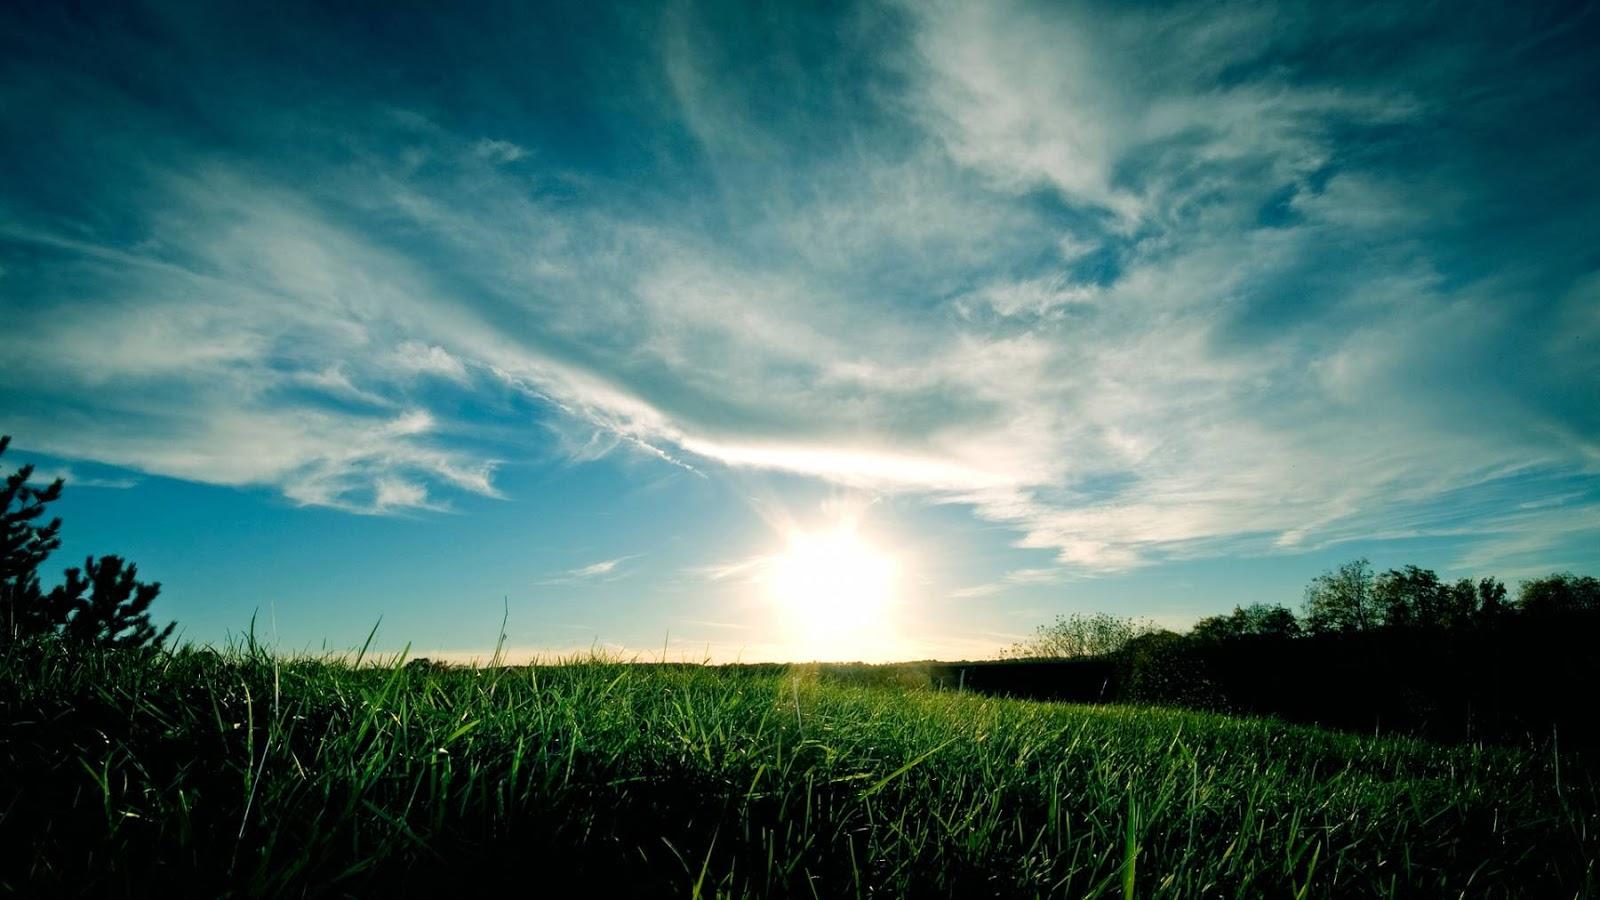 http://2.bp.blogspot.com/-UiYK9OV1q7s/UMip-lmbjuI/AAAAAAAADBY/Hp5N9NWnCCM/s1600/Fantastic+HD+Nature+Wallpaper+2.jpg